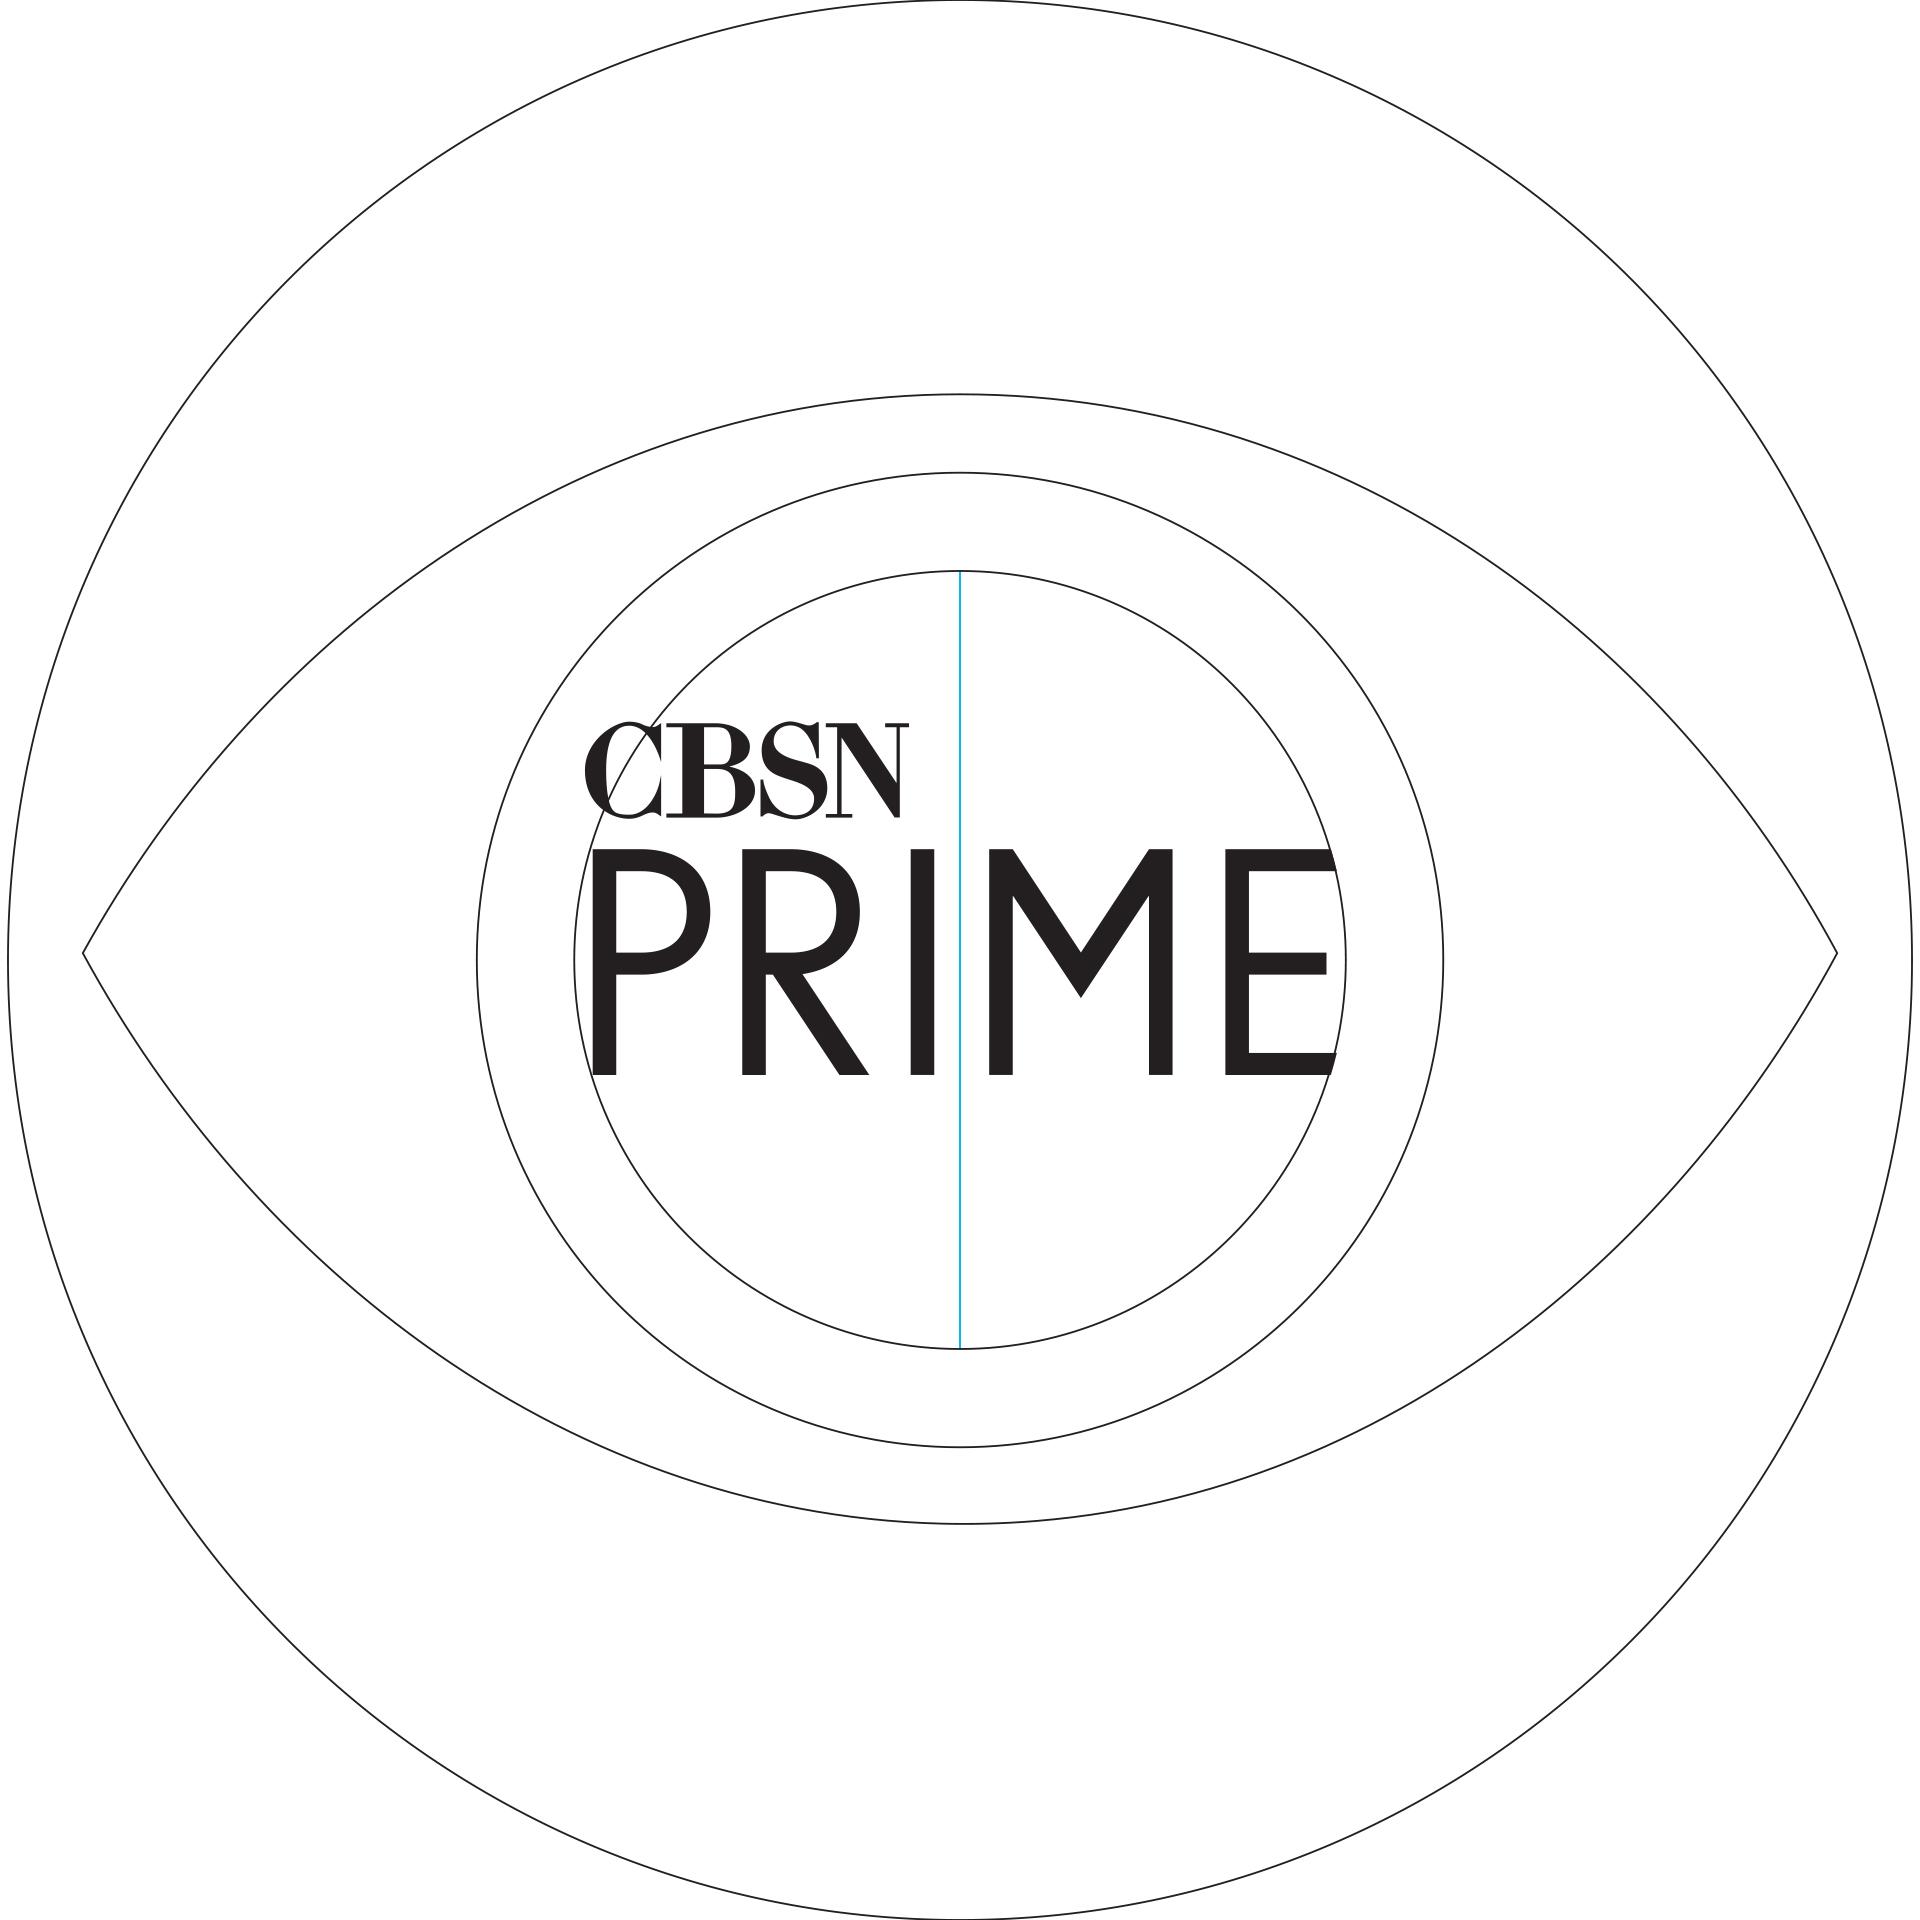 CBSNPRIME-TreatmentA-WordmarkBreakdown.jpg